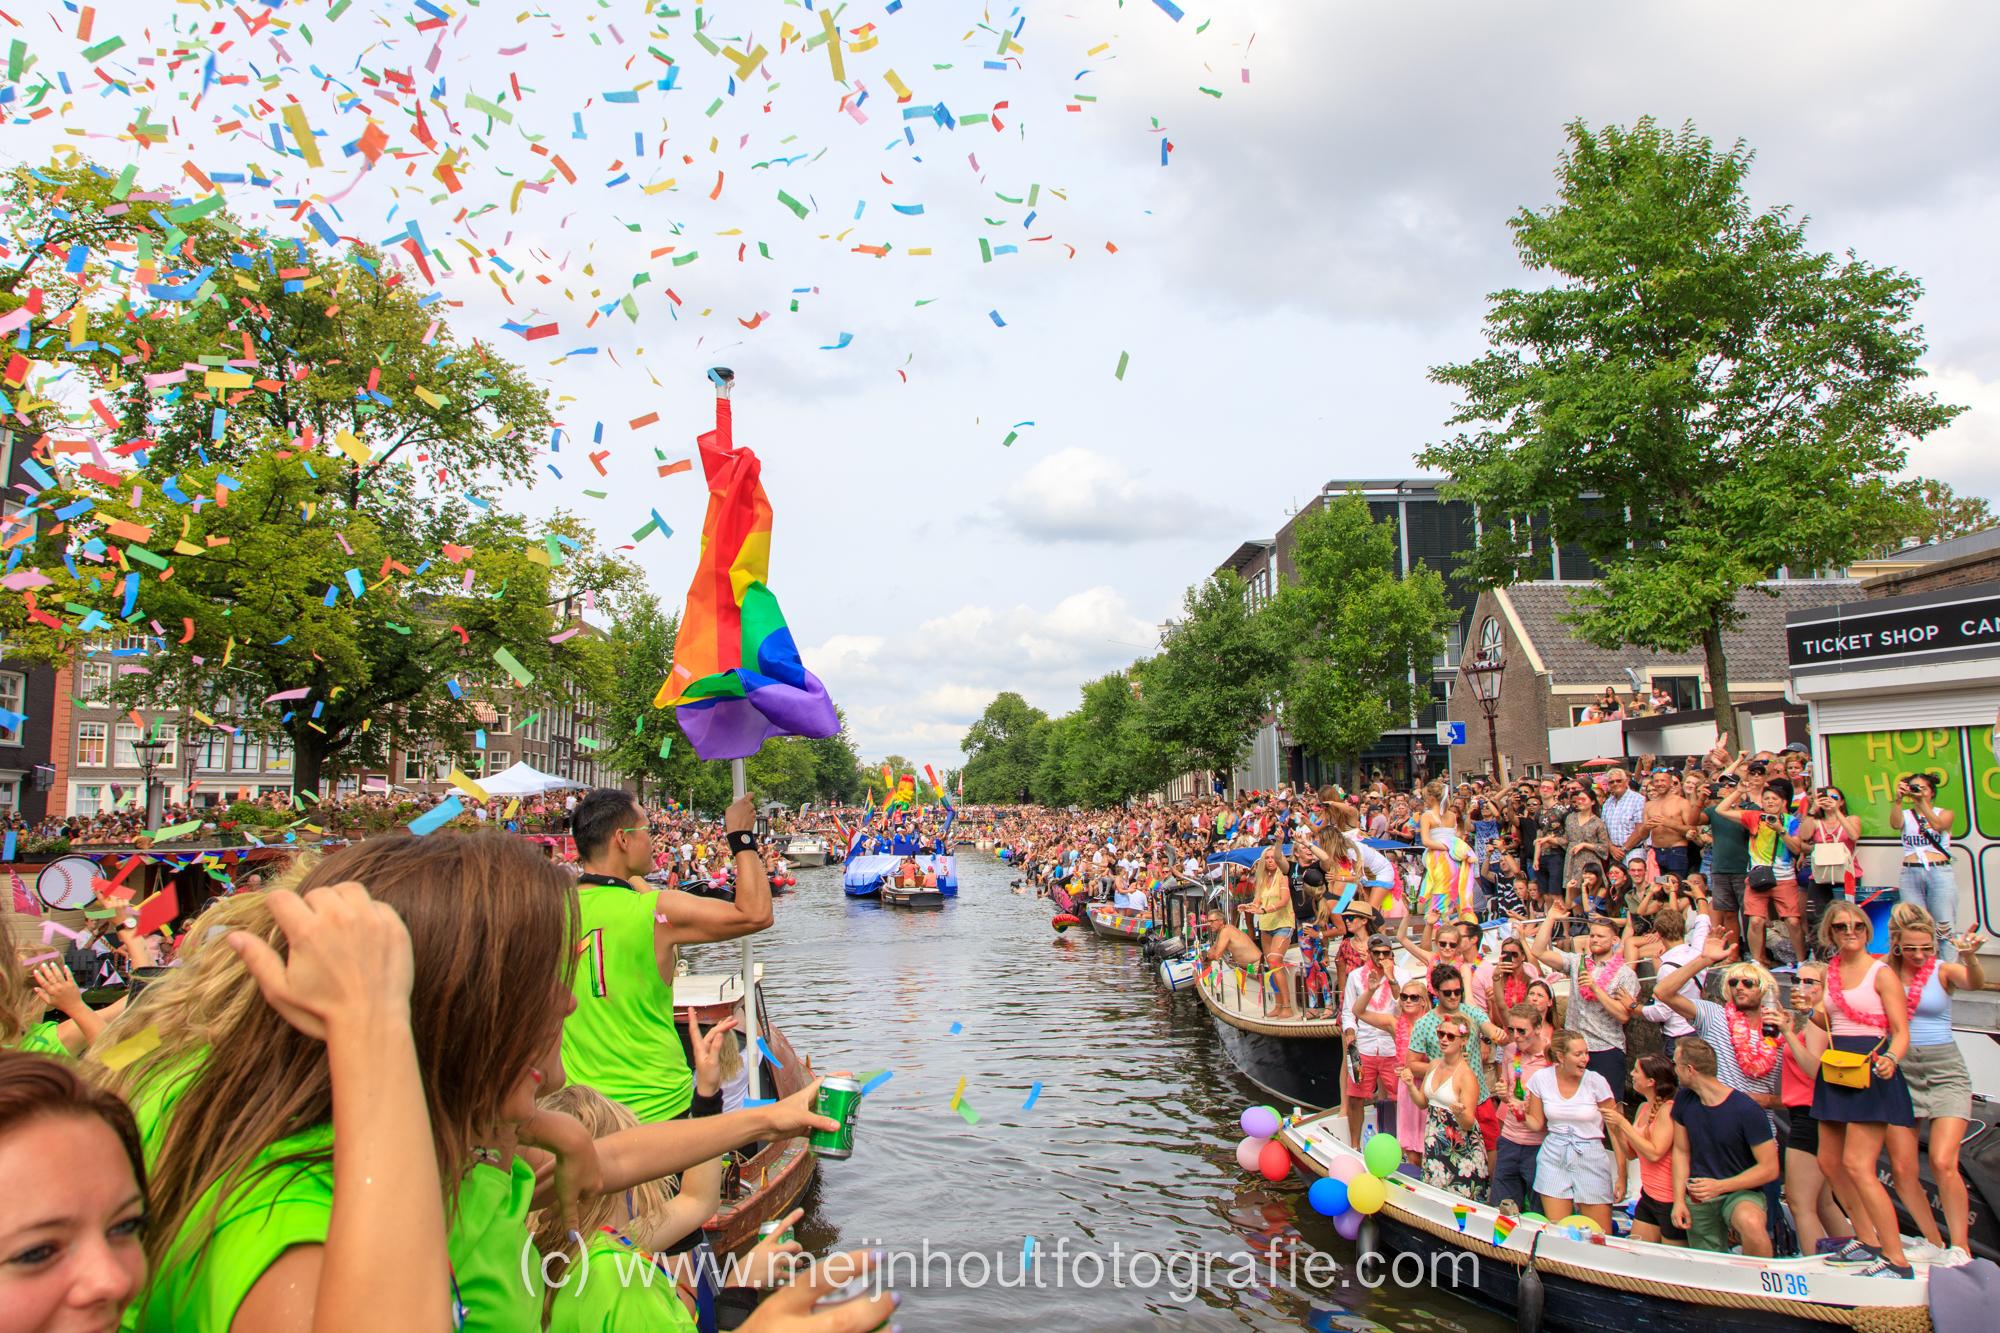 20180804-_MG_0434 Deloitte Gay Pride 2018.jpg